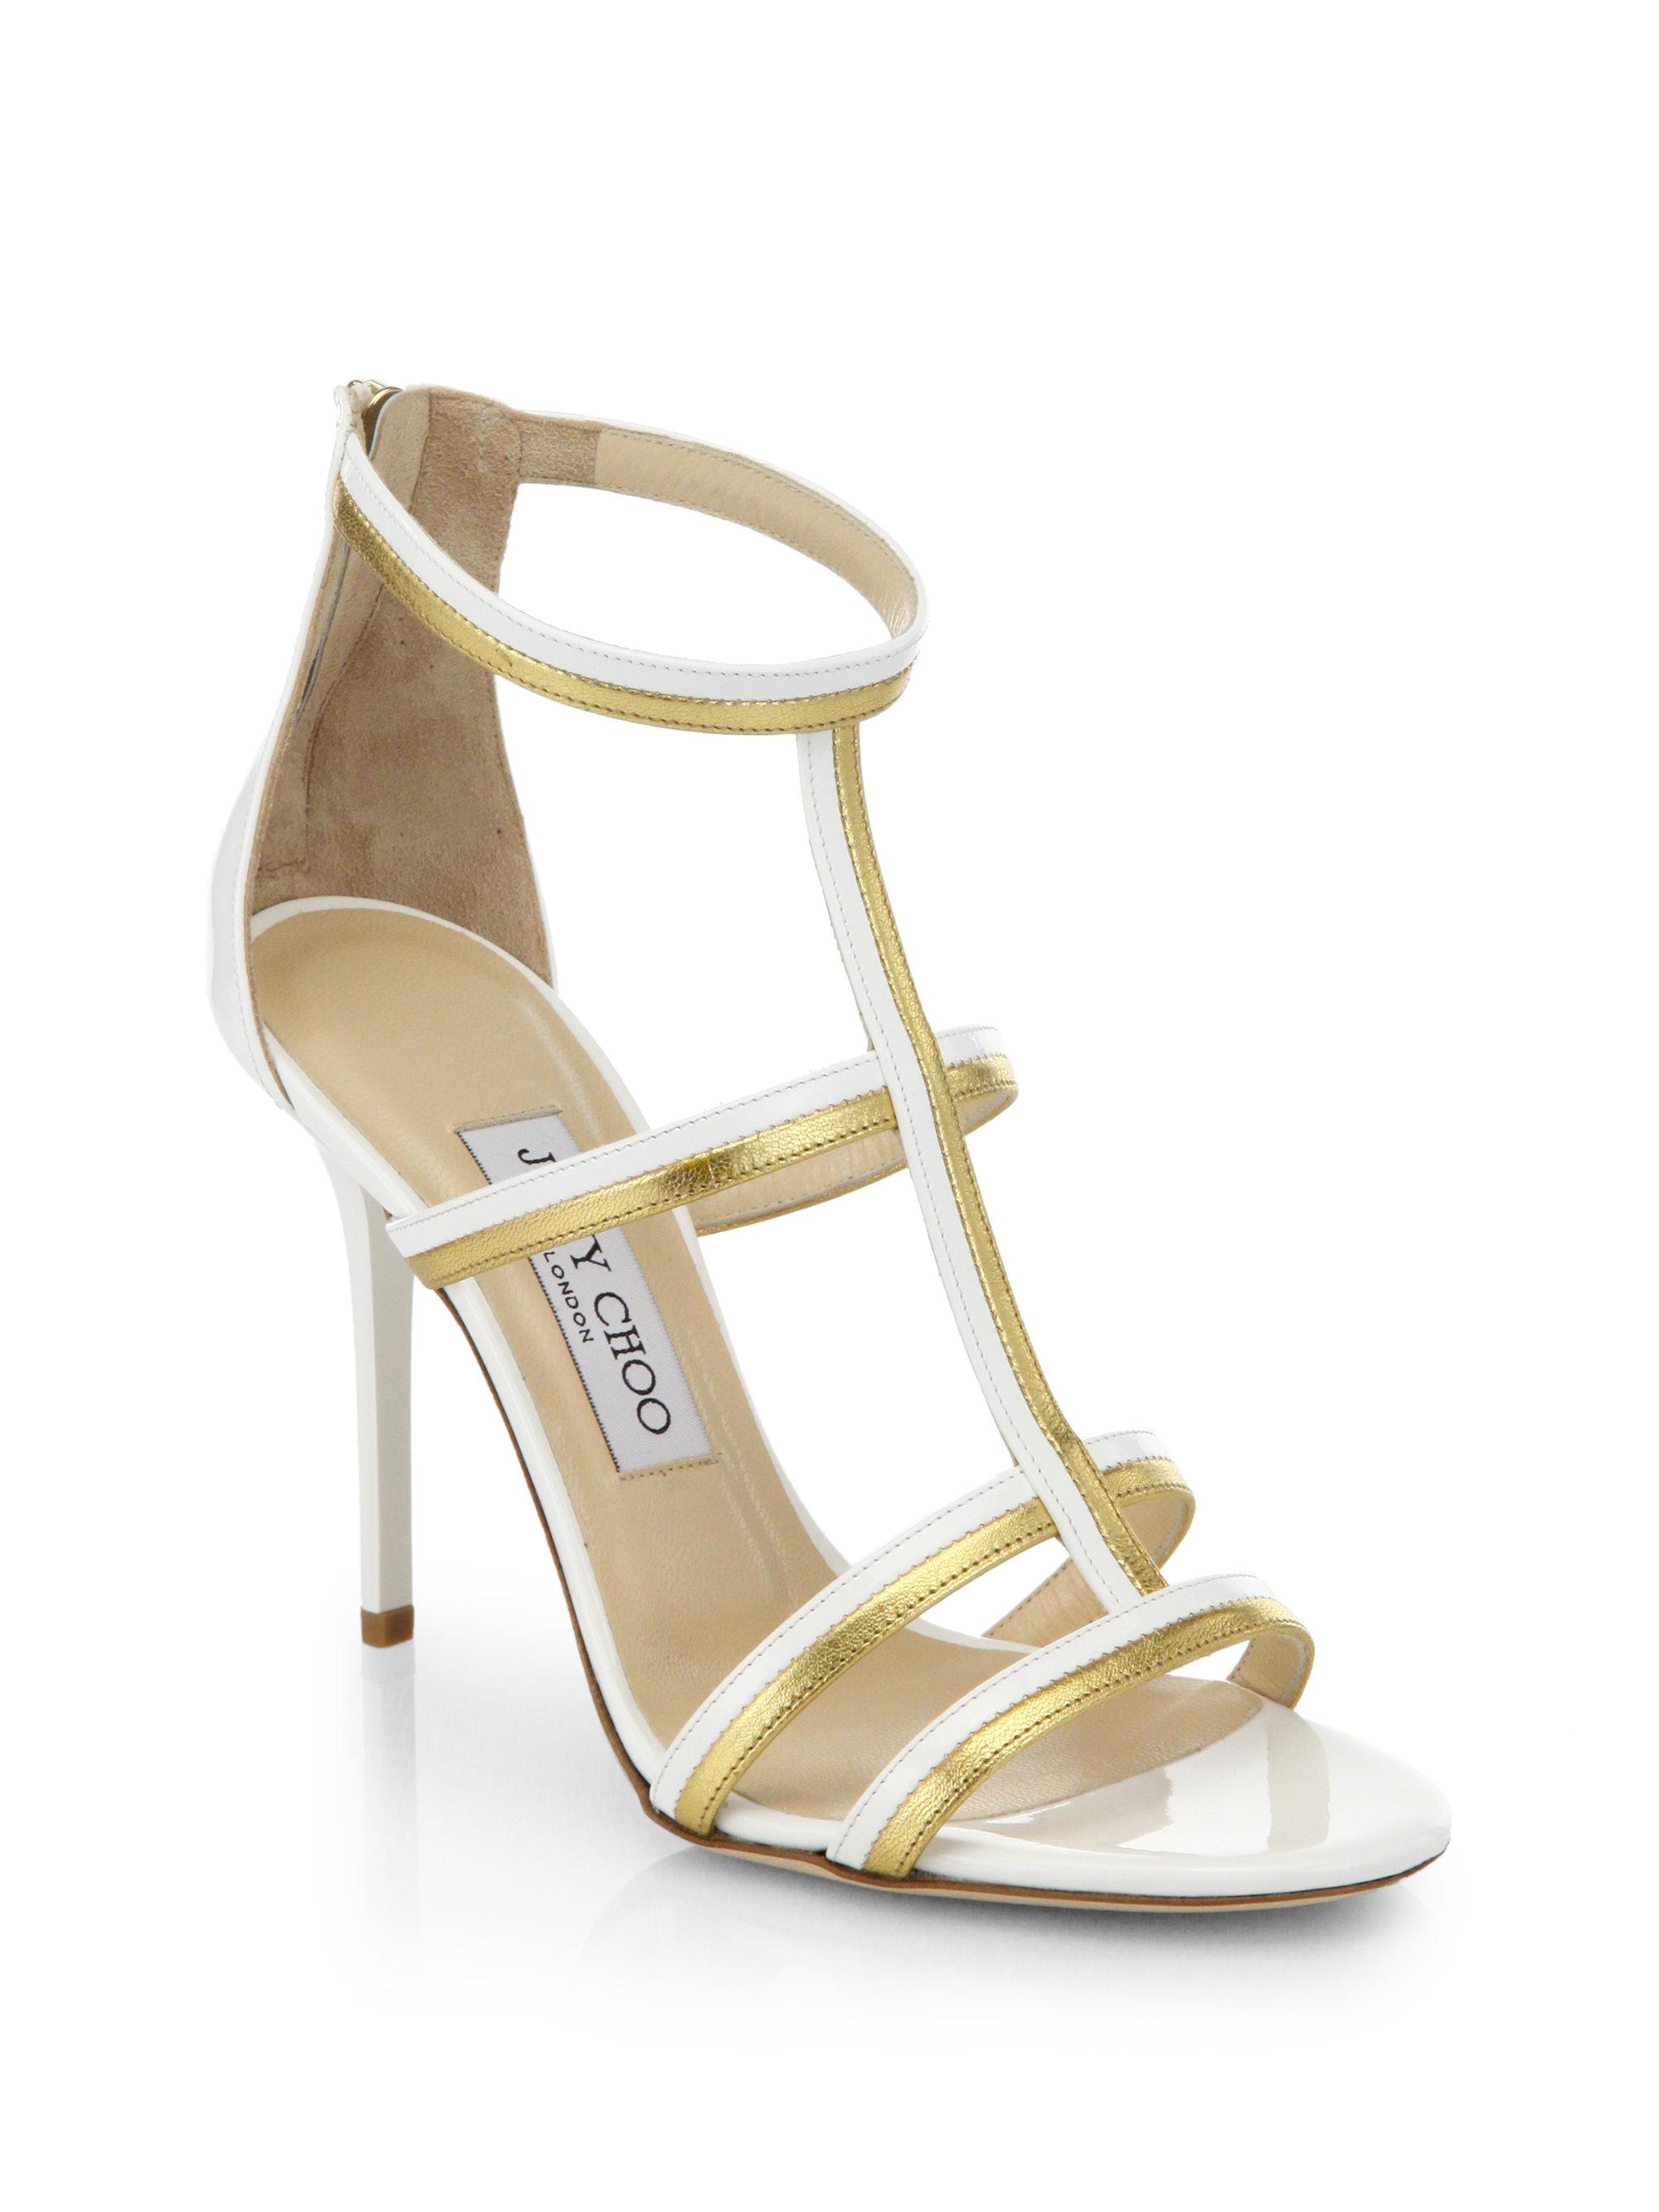 Jimmy Choo Thistle Patent Metallic Leather Sandals